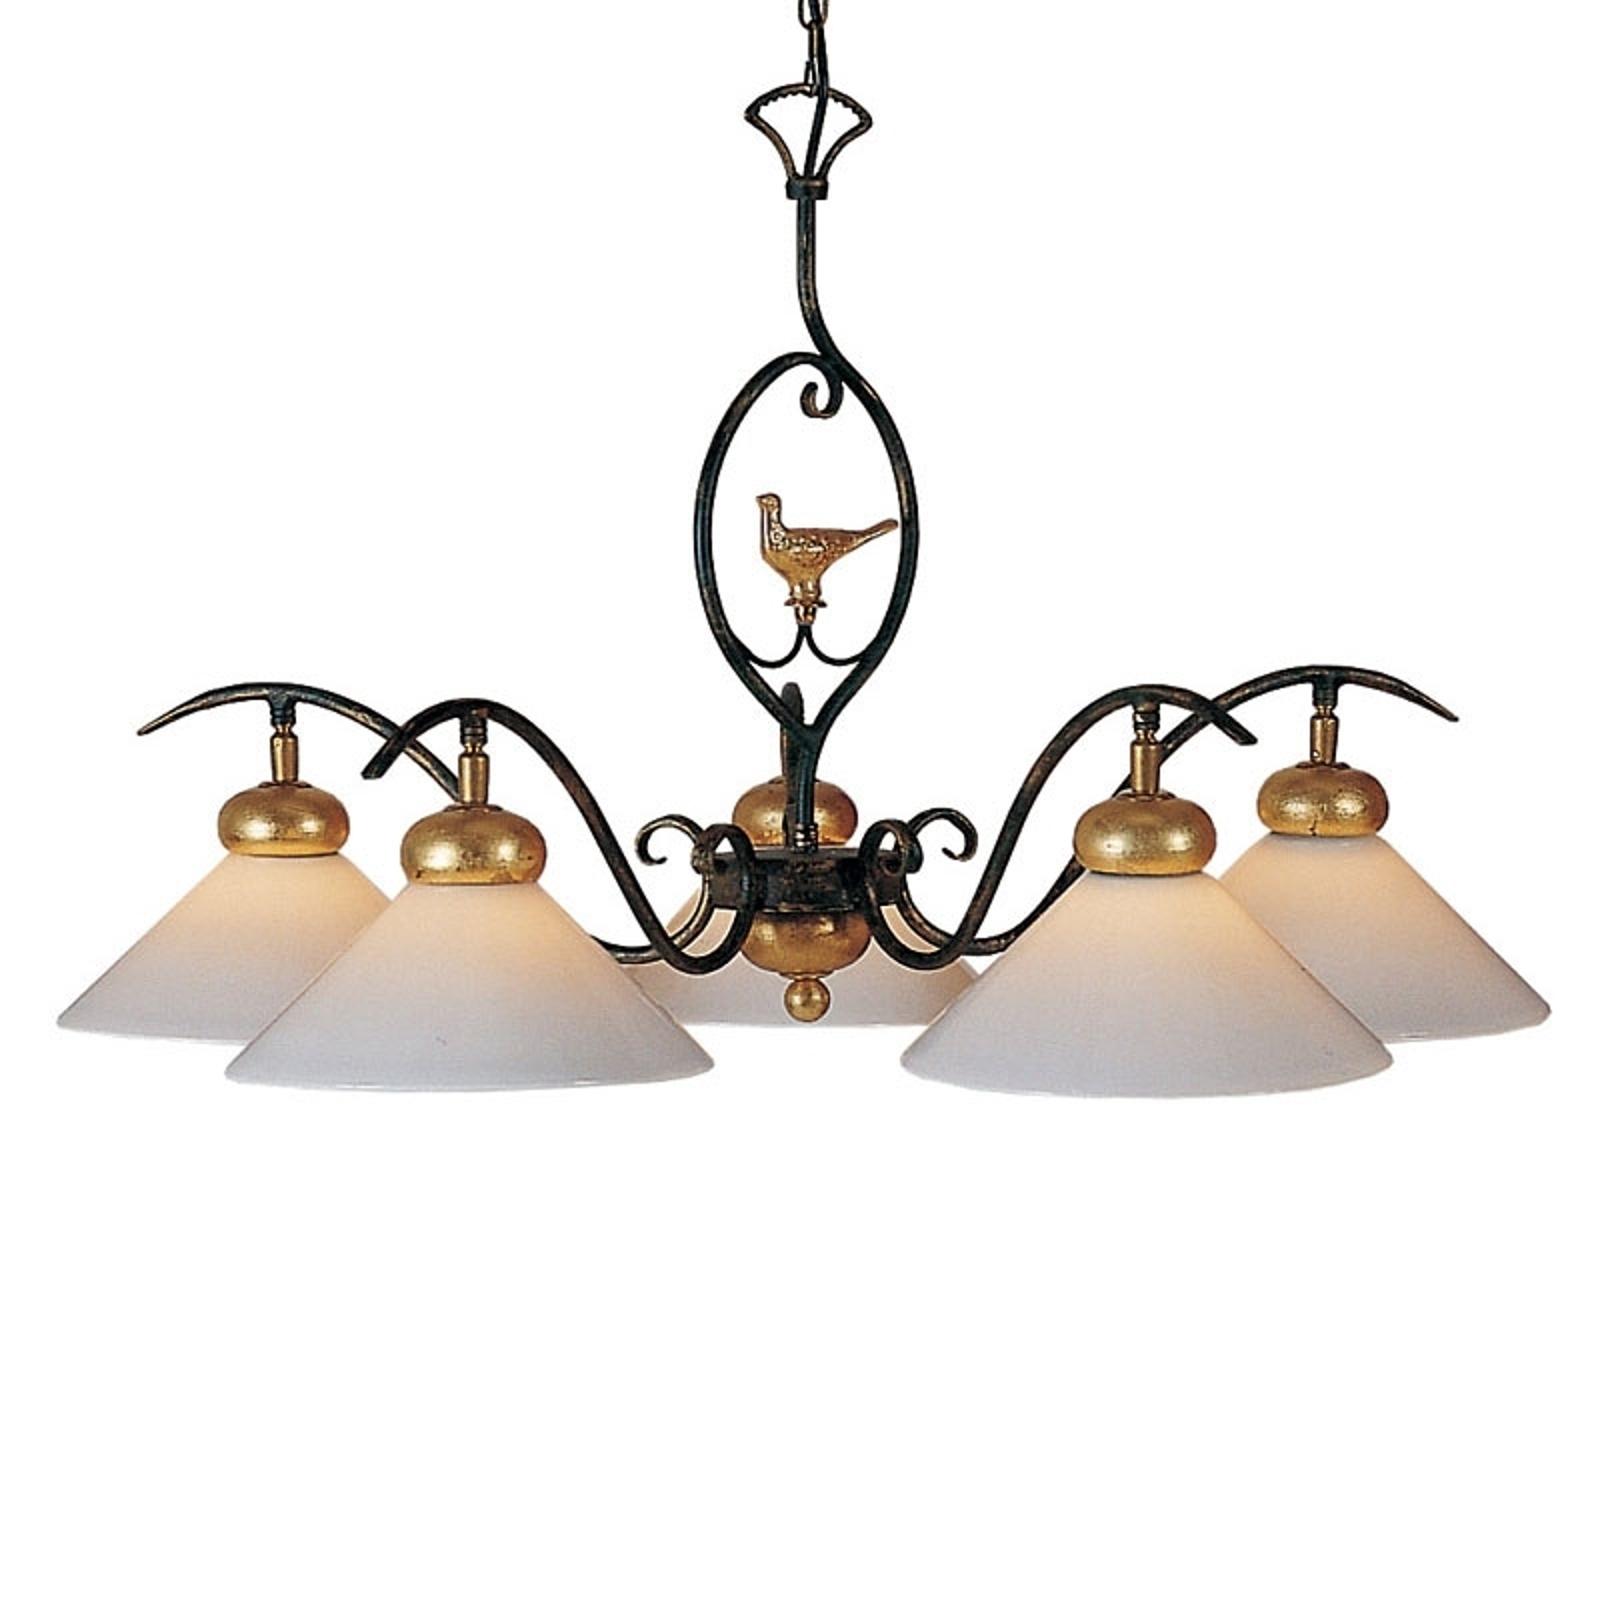 Romantische hanglamp, PROVENCE CHALET